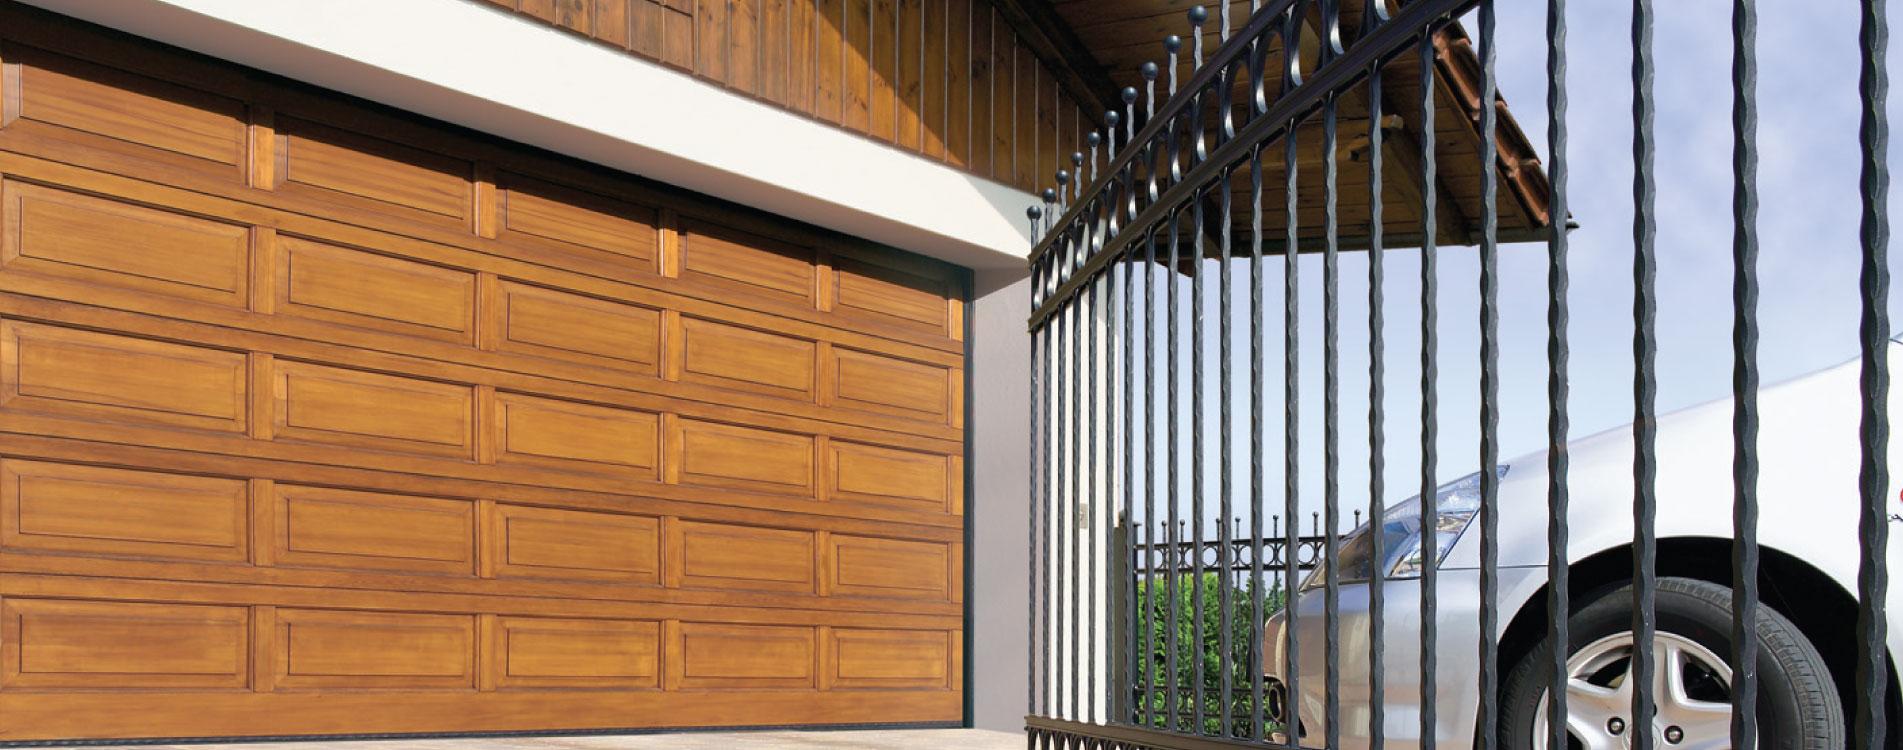 Hormann Sectional Timber Garage Doors